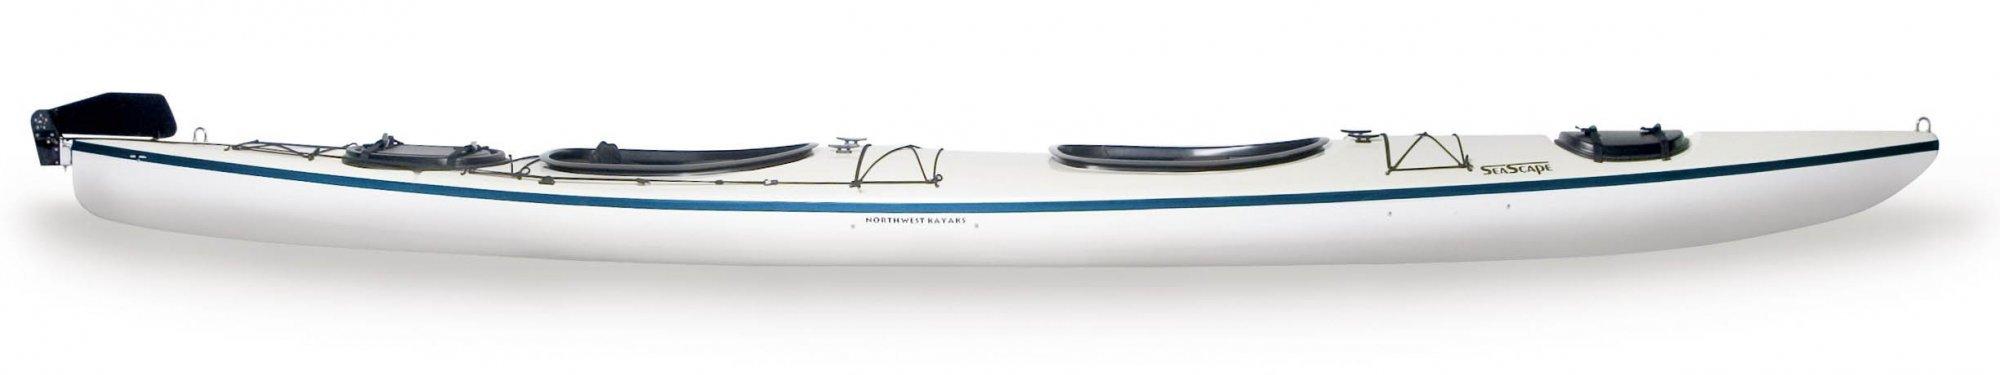 USED -- Northwest Kayak Seascape 2 Kayak w/ Rudder (AKT20)